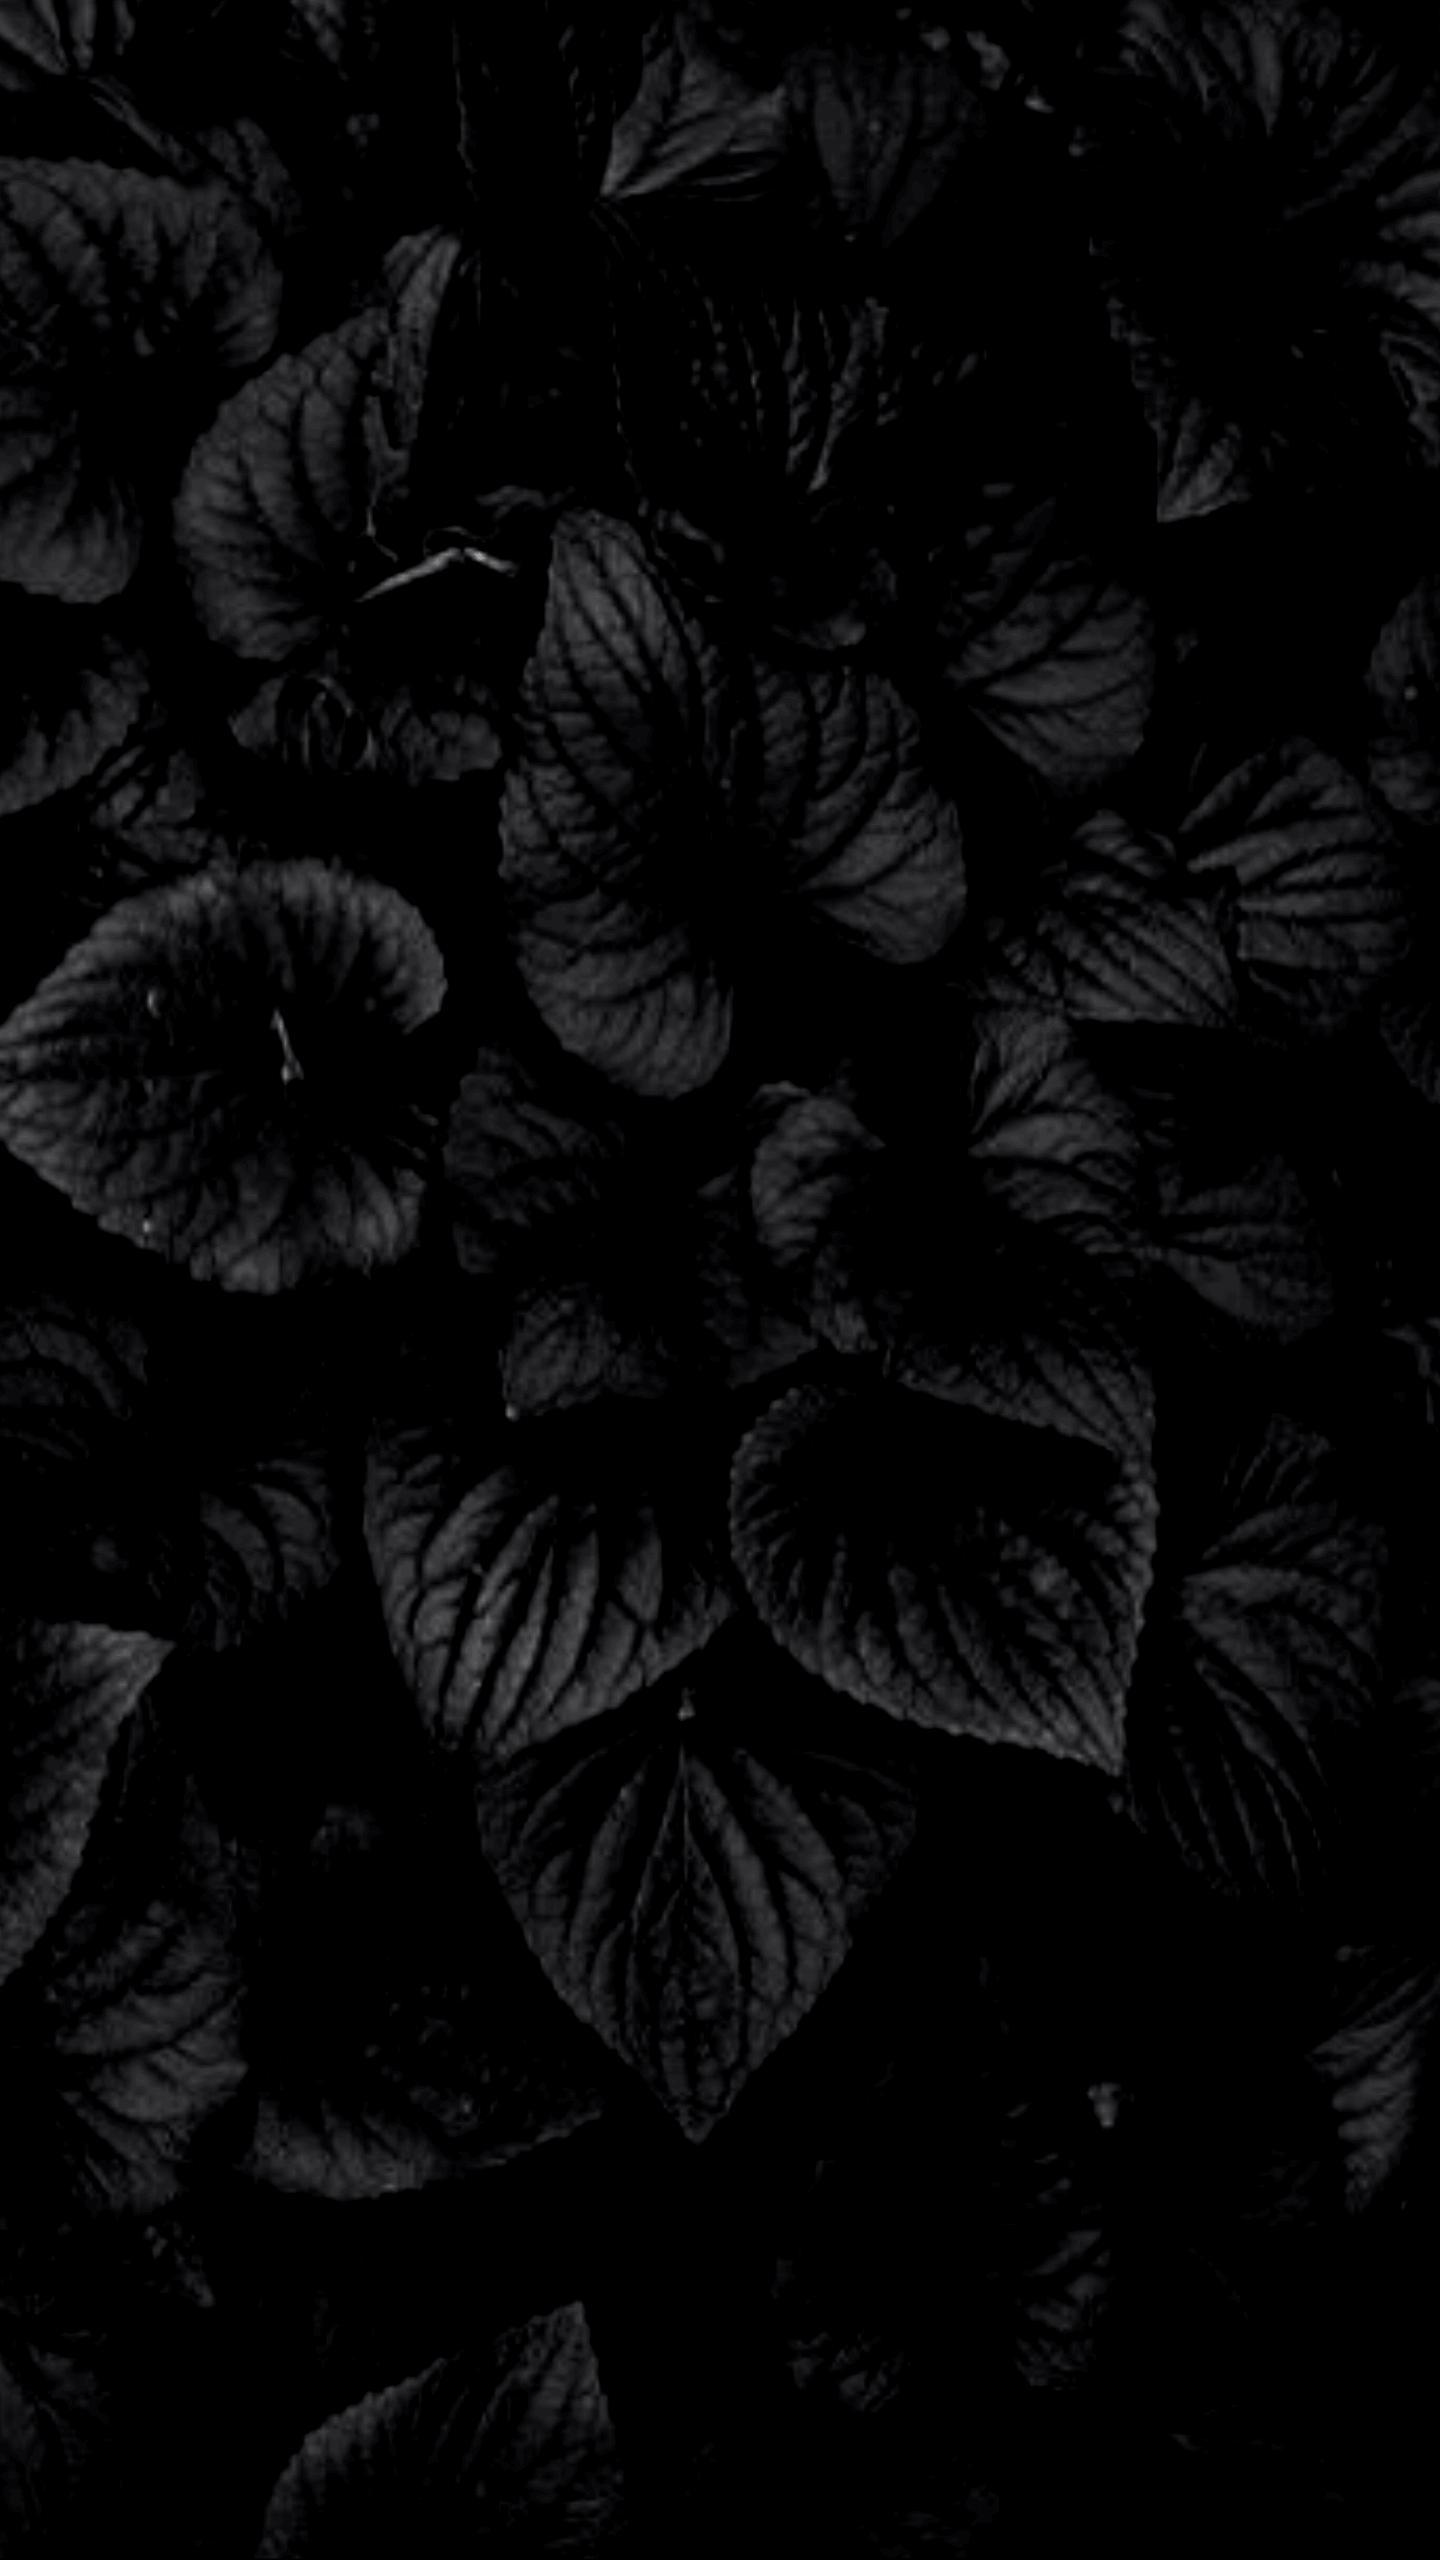 4k Wallpapers Of Dark Gallery Wallpaper 4k 4kwallpaper 4kwallpaperphone 4kchristmaswallpaperiphon Siyah Duvar Kagidi Siyah Guller Telefon Duvar Kagitlari